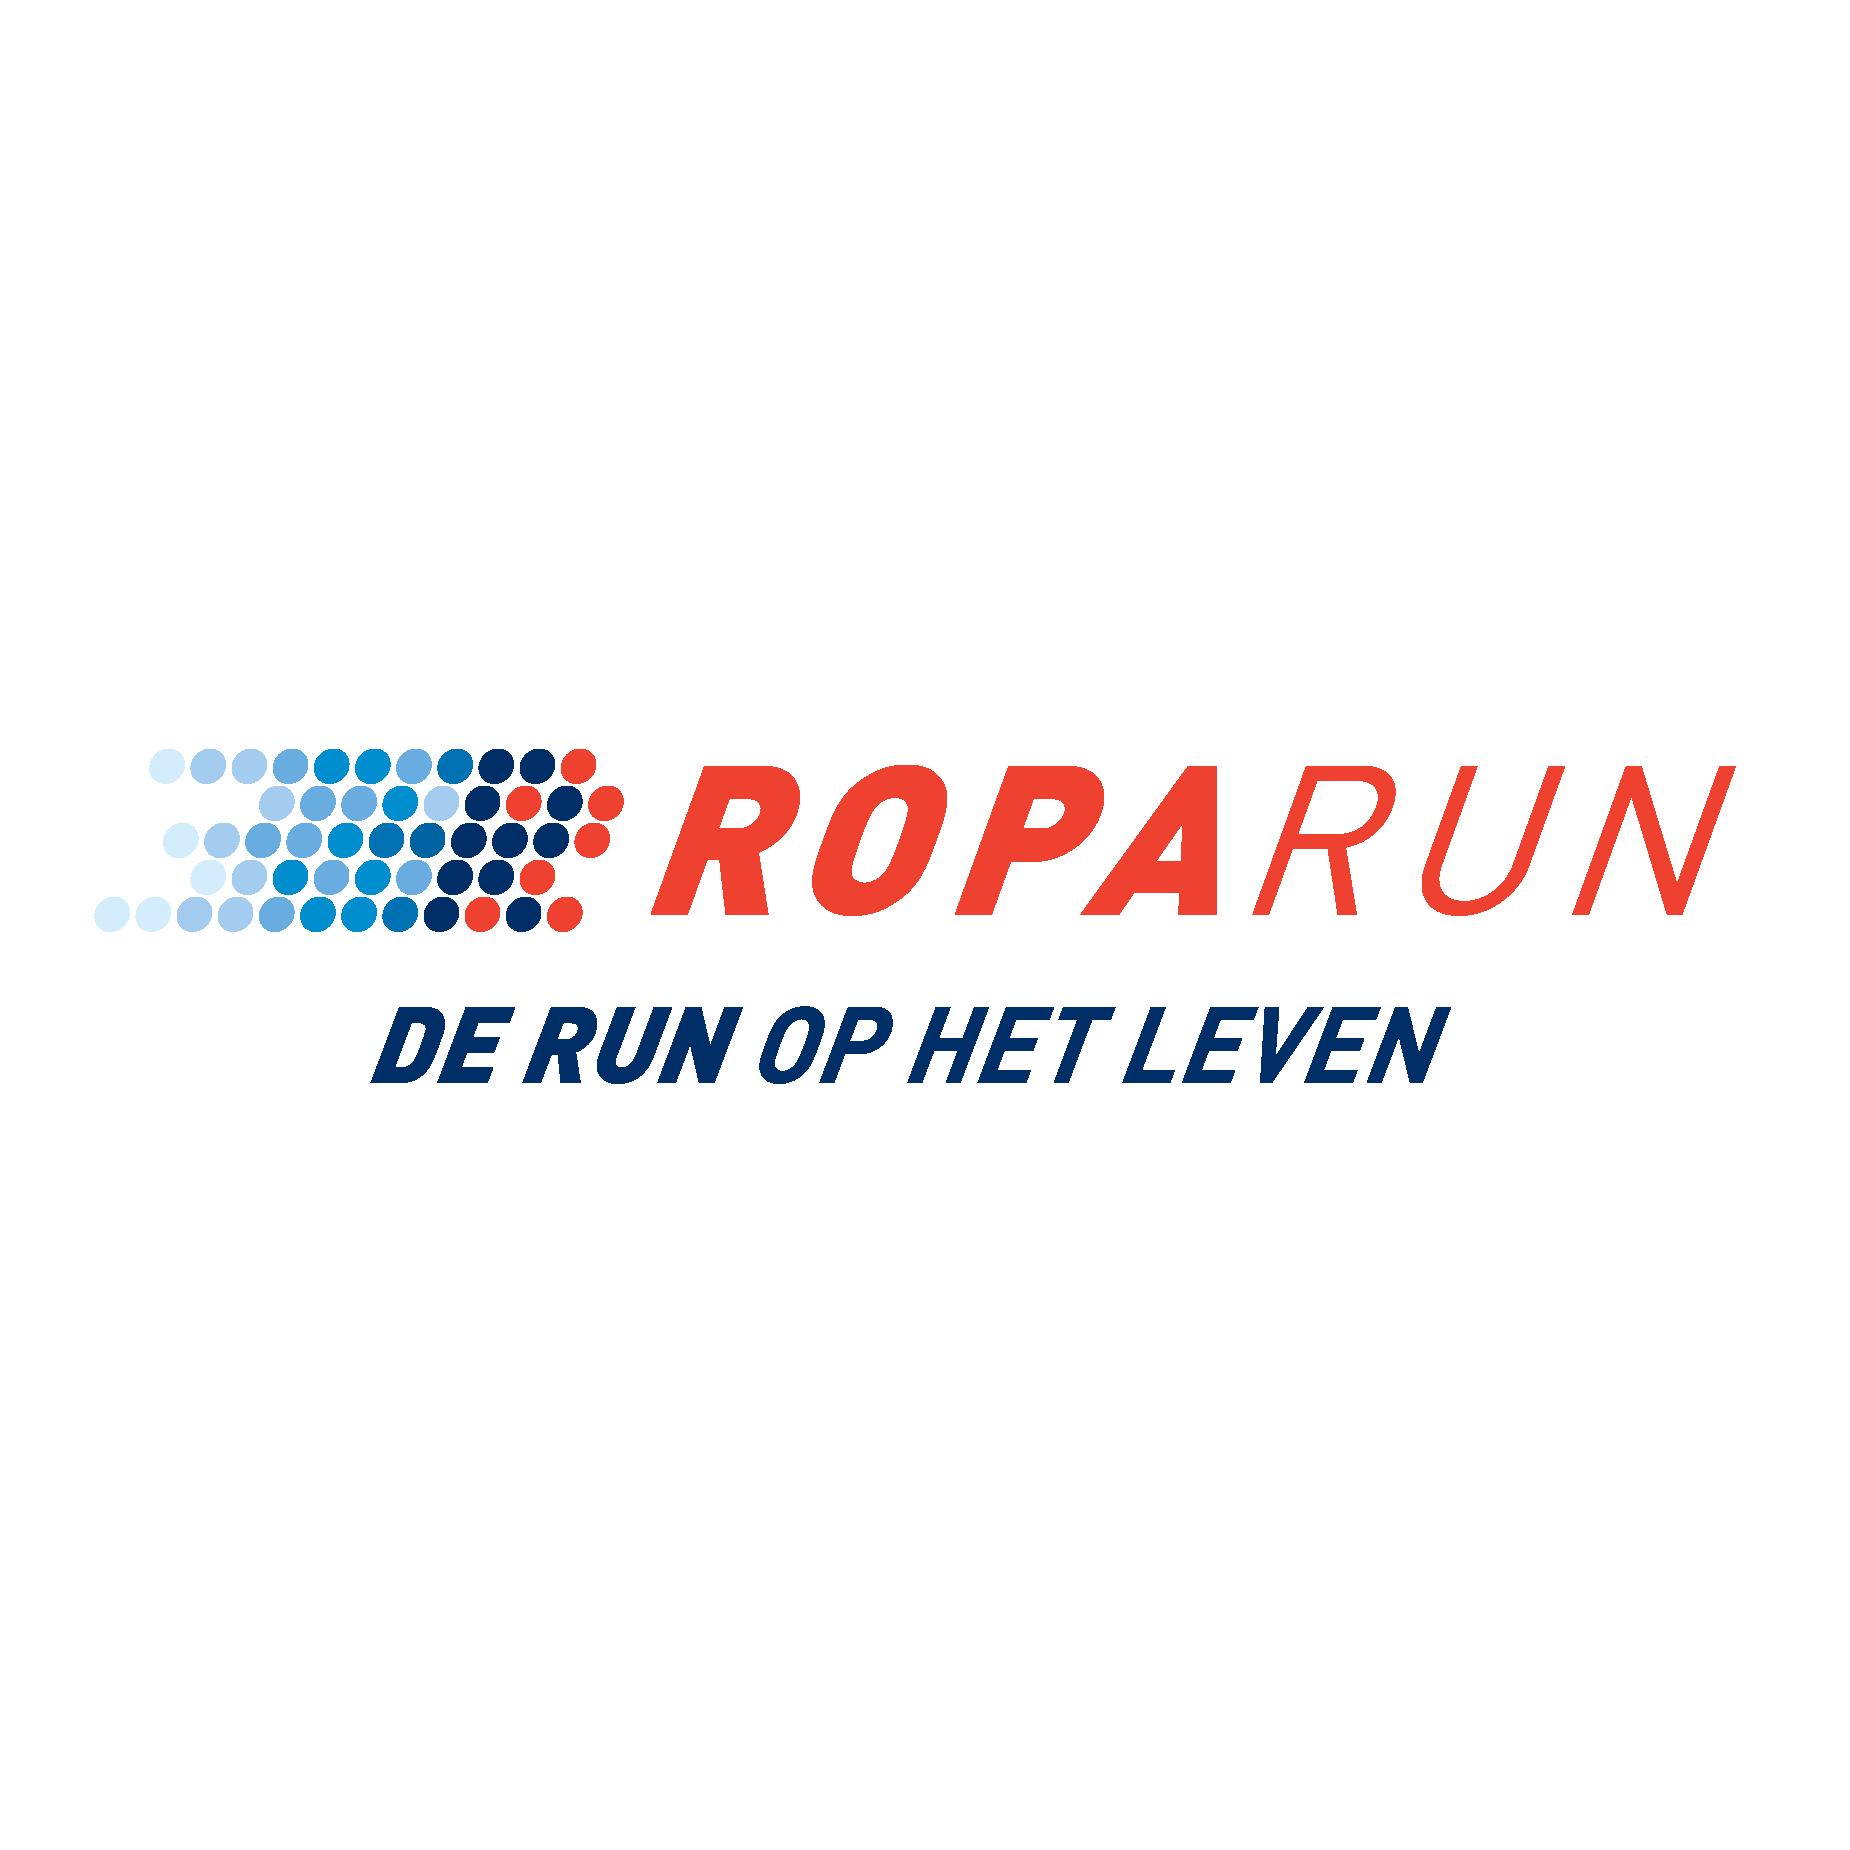 Roparun team Reeshof for Cancer  De run op het leven   Het Social Media Mannetje